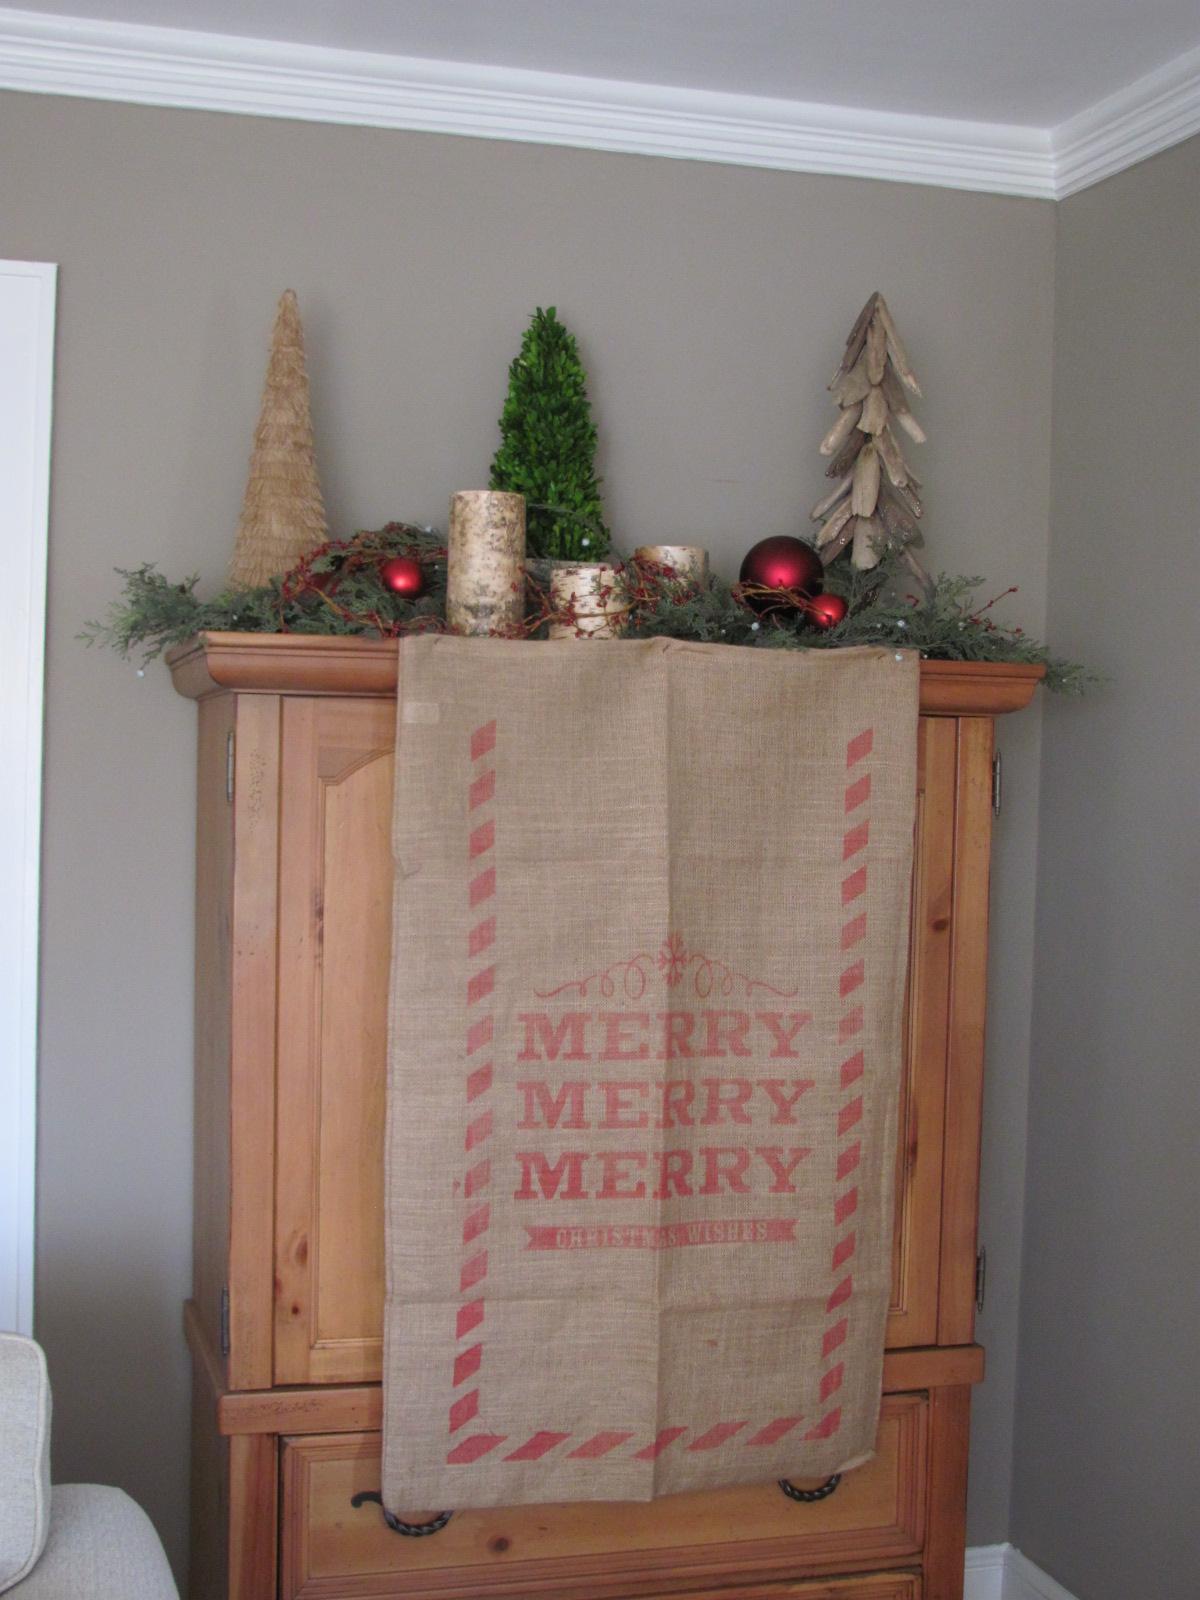 Seasonal Christmas Decor by Professional Organizer